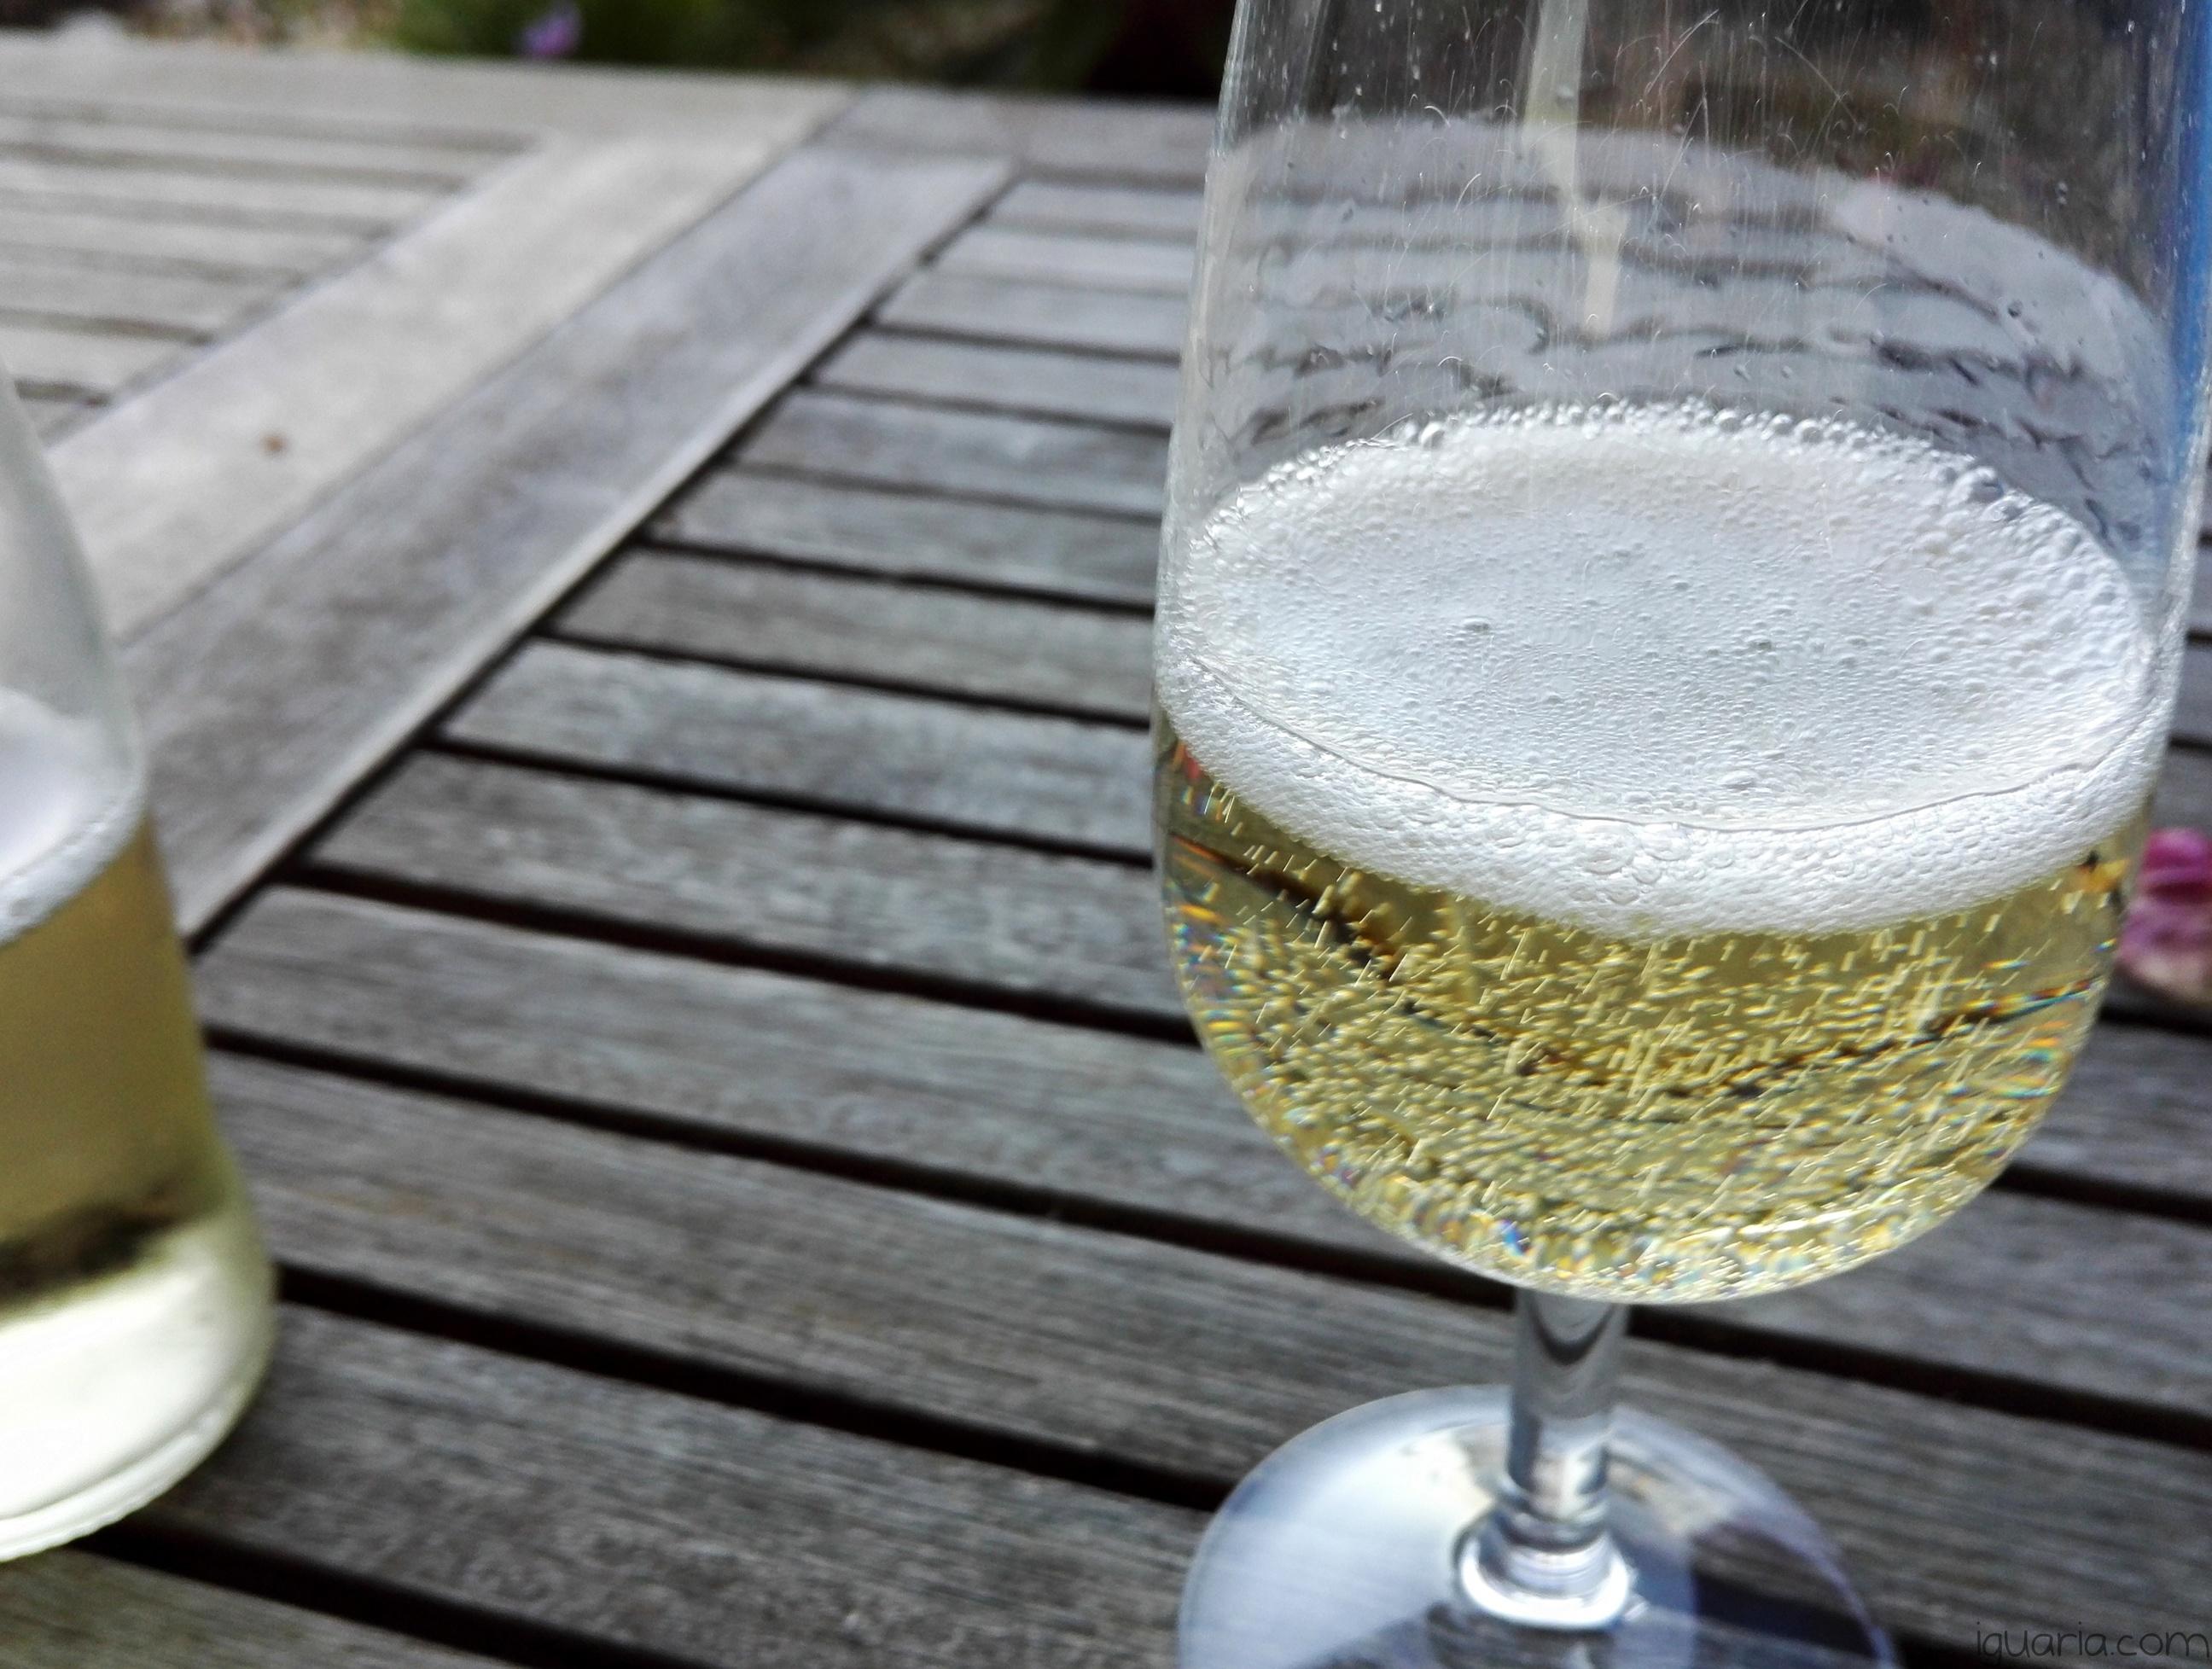 Iguaria_Schweppes-Ginger-Ale-Efervescente